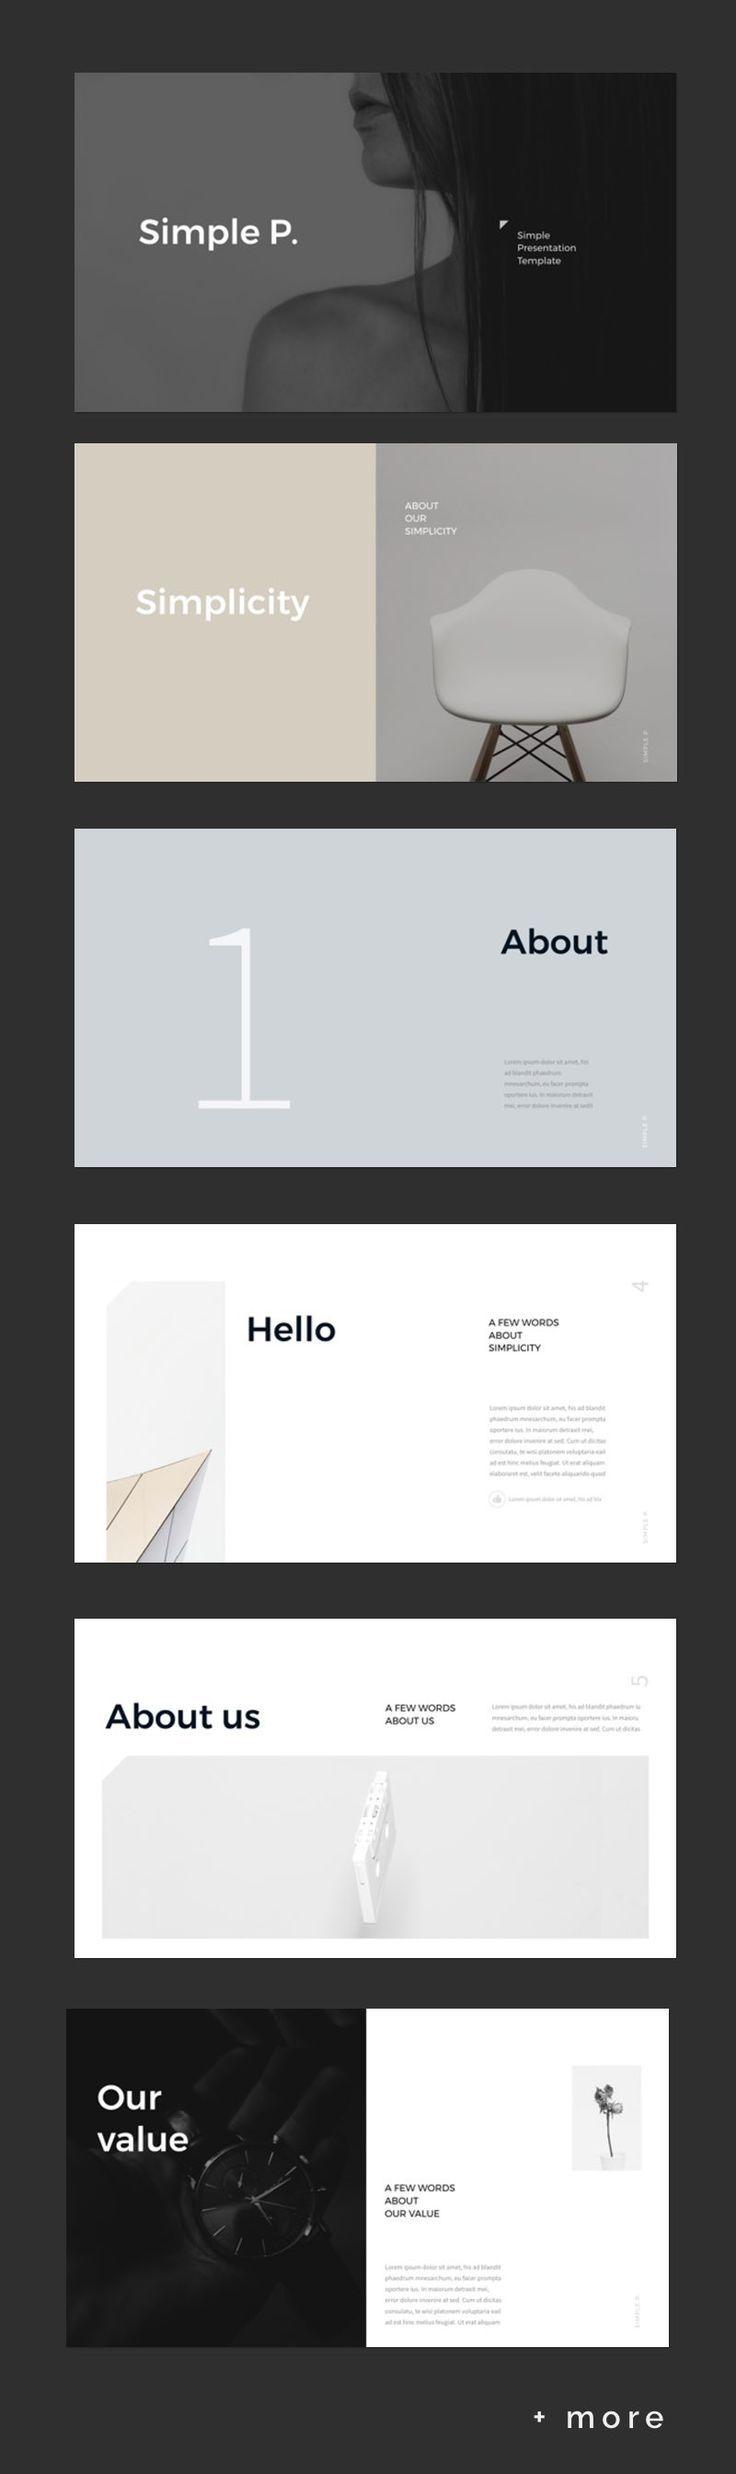 simple minimal presentation template simple presentation ppt